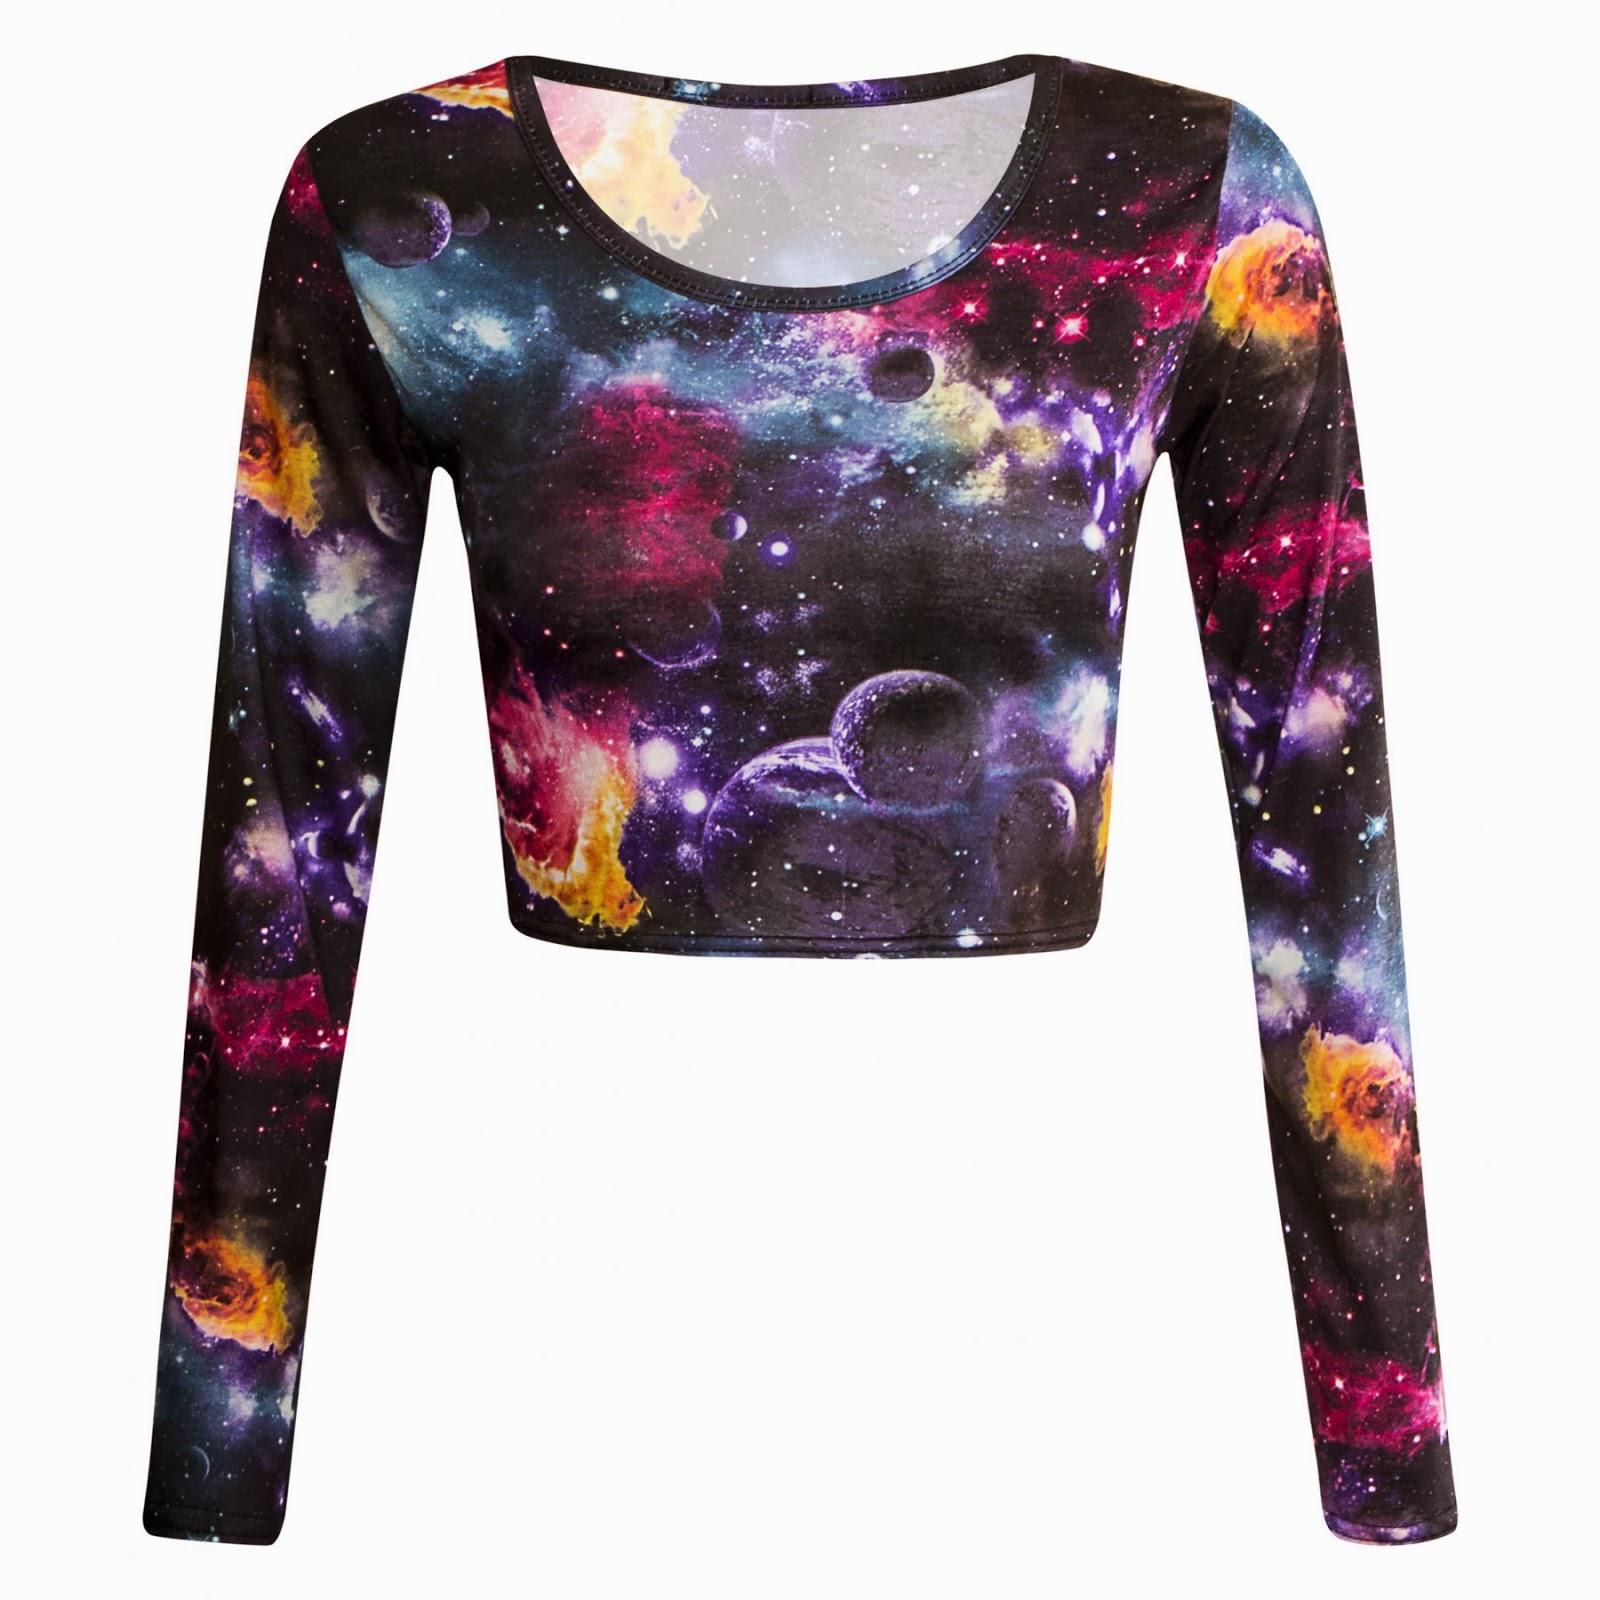 Anime And Galaxy Galaxy Clothing